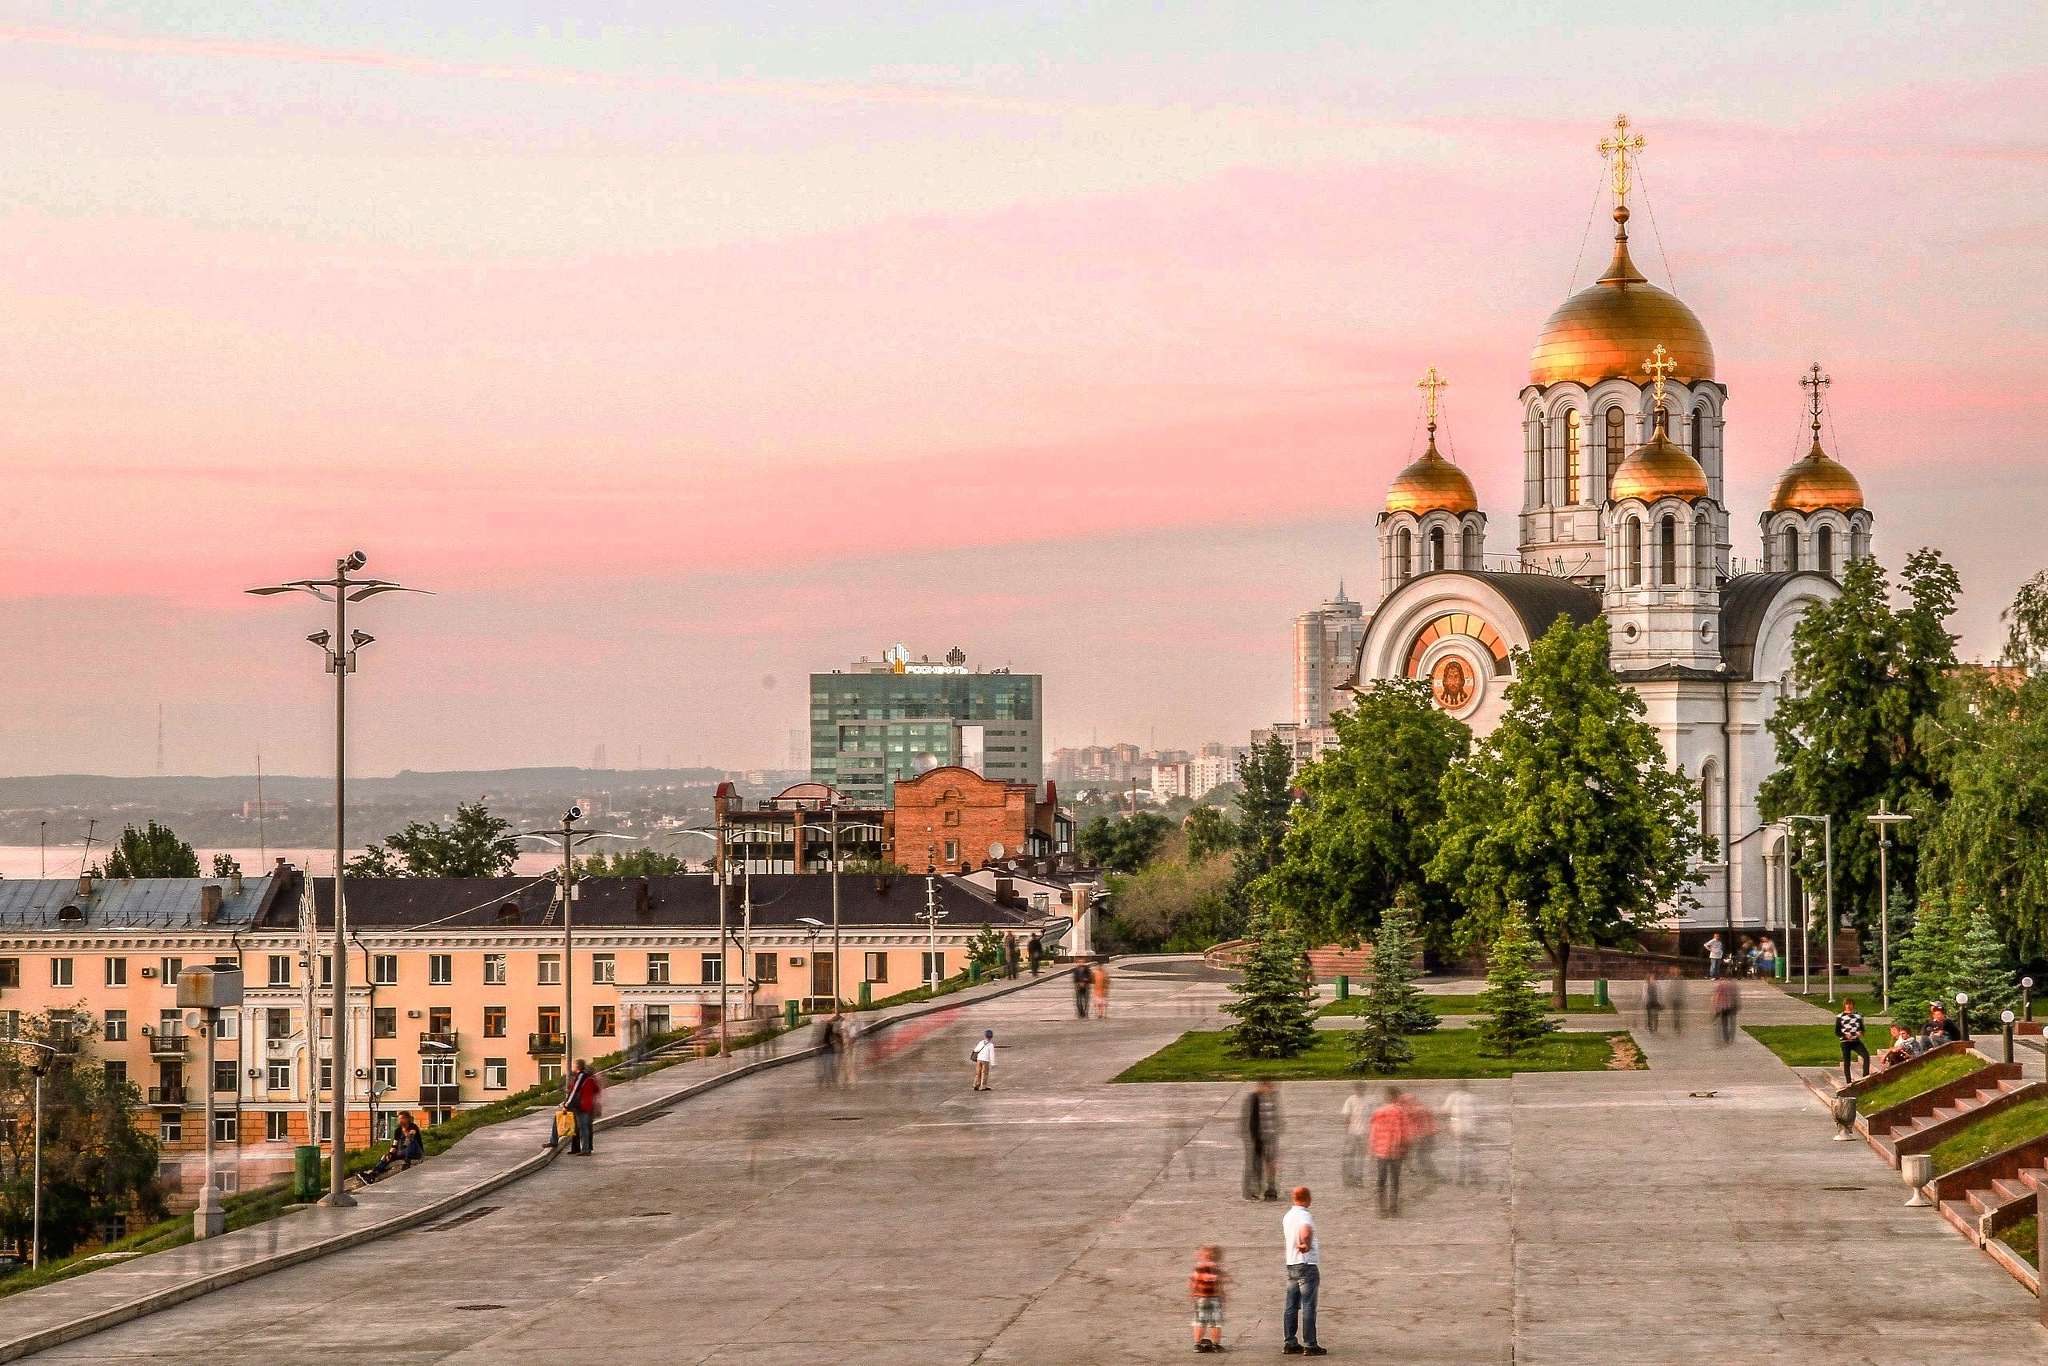 Sunset by Sergey Maksimov